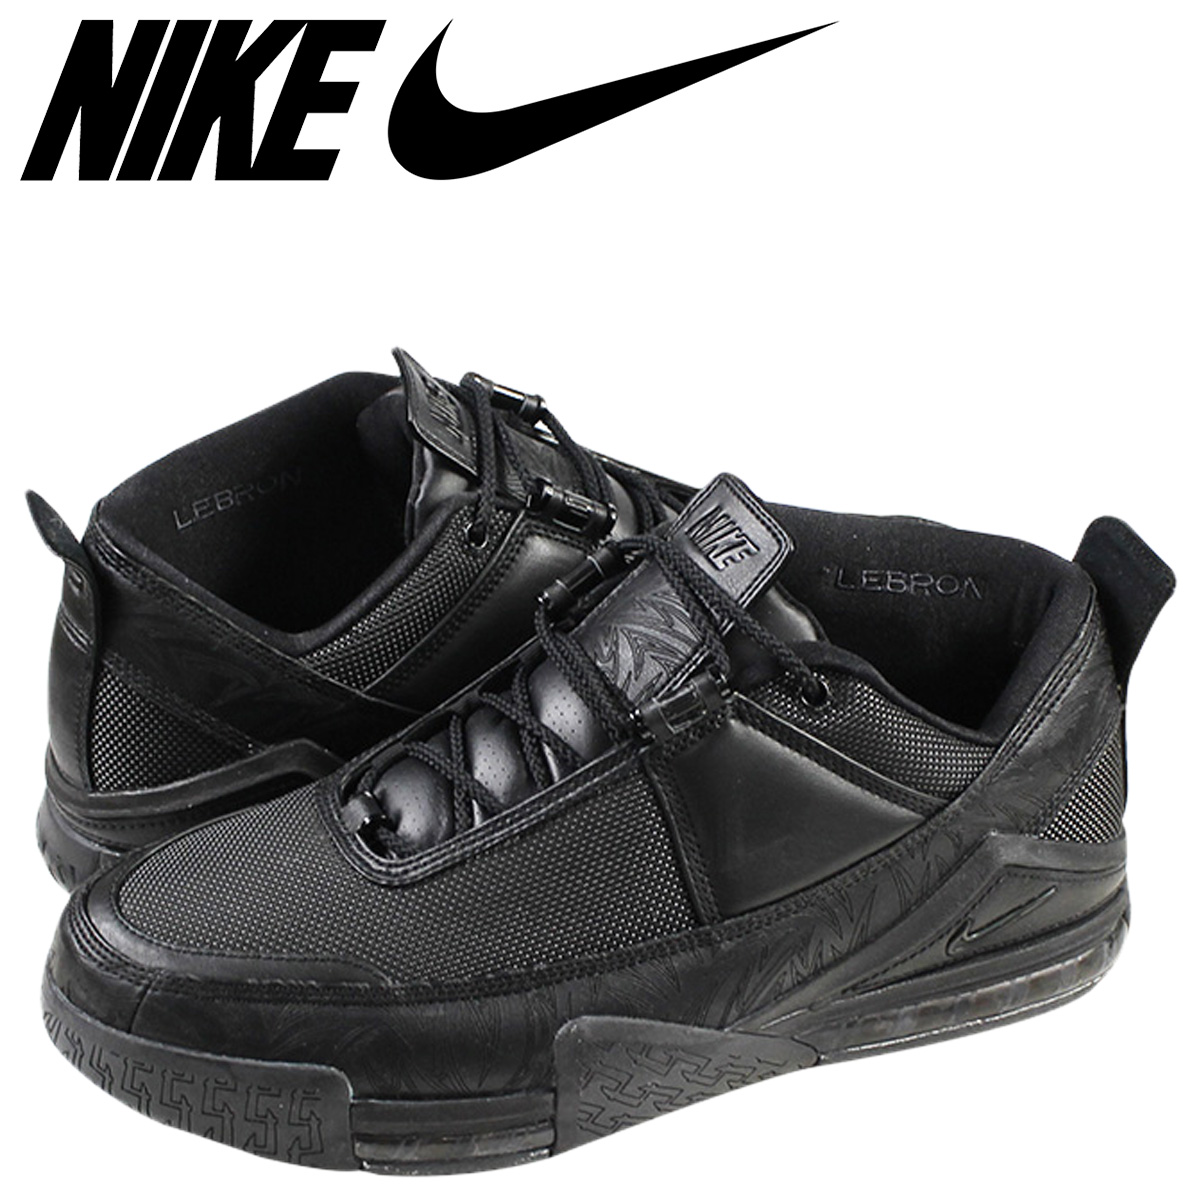 more photos d6450 b2ce6 ... ireland nike nike zoom lebron sneaker zoom lebron 2 low 310845 001  black mens 120ab 2368f